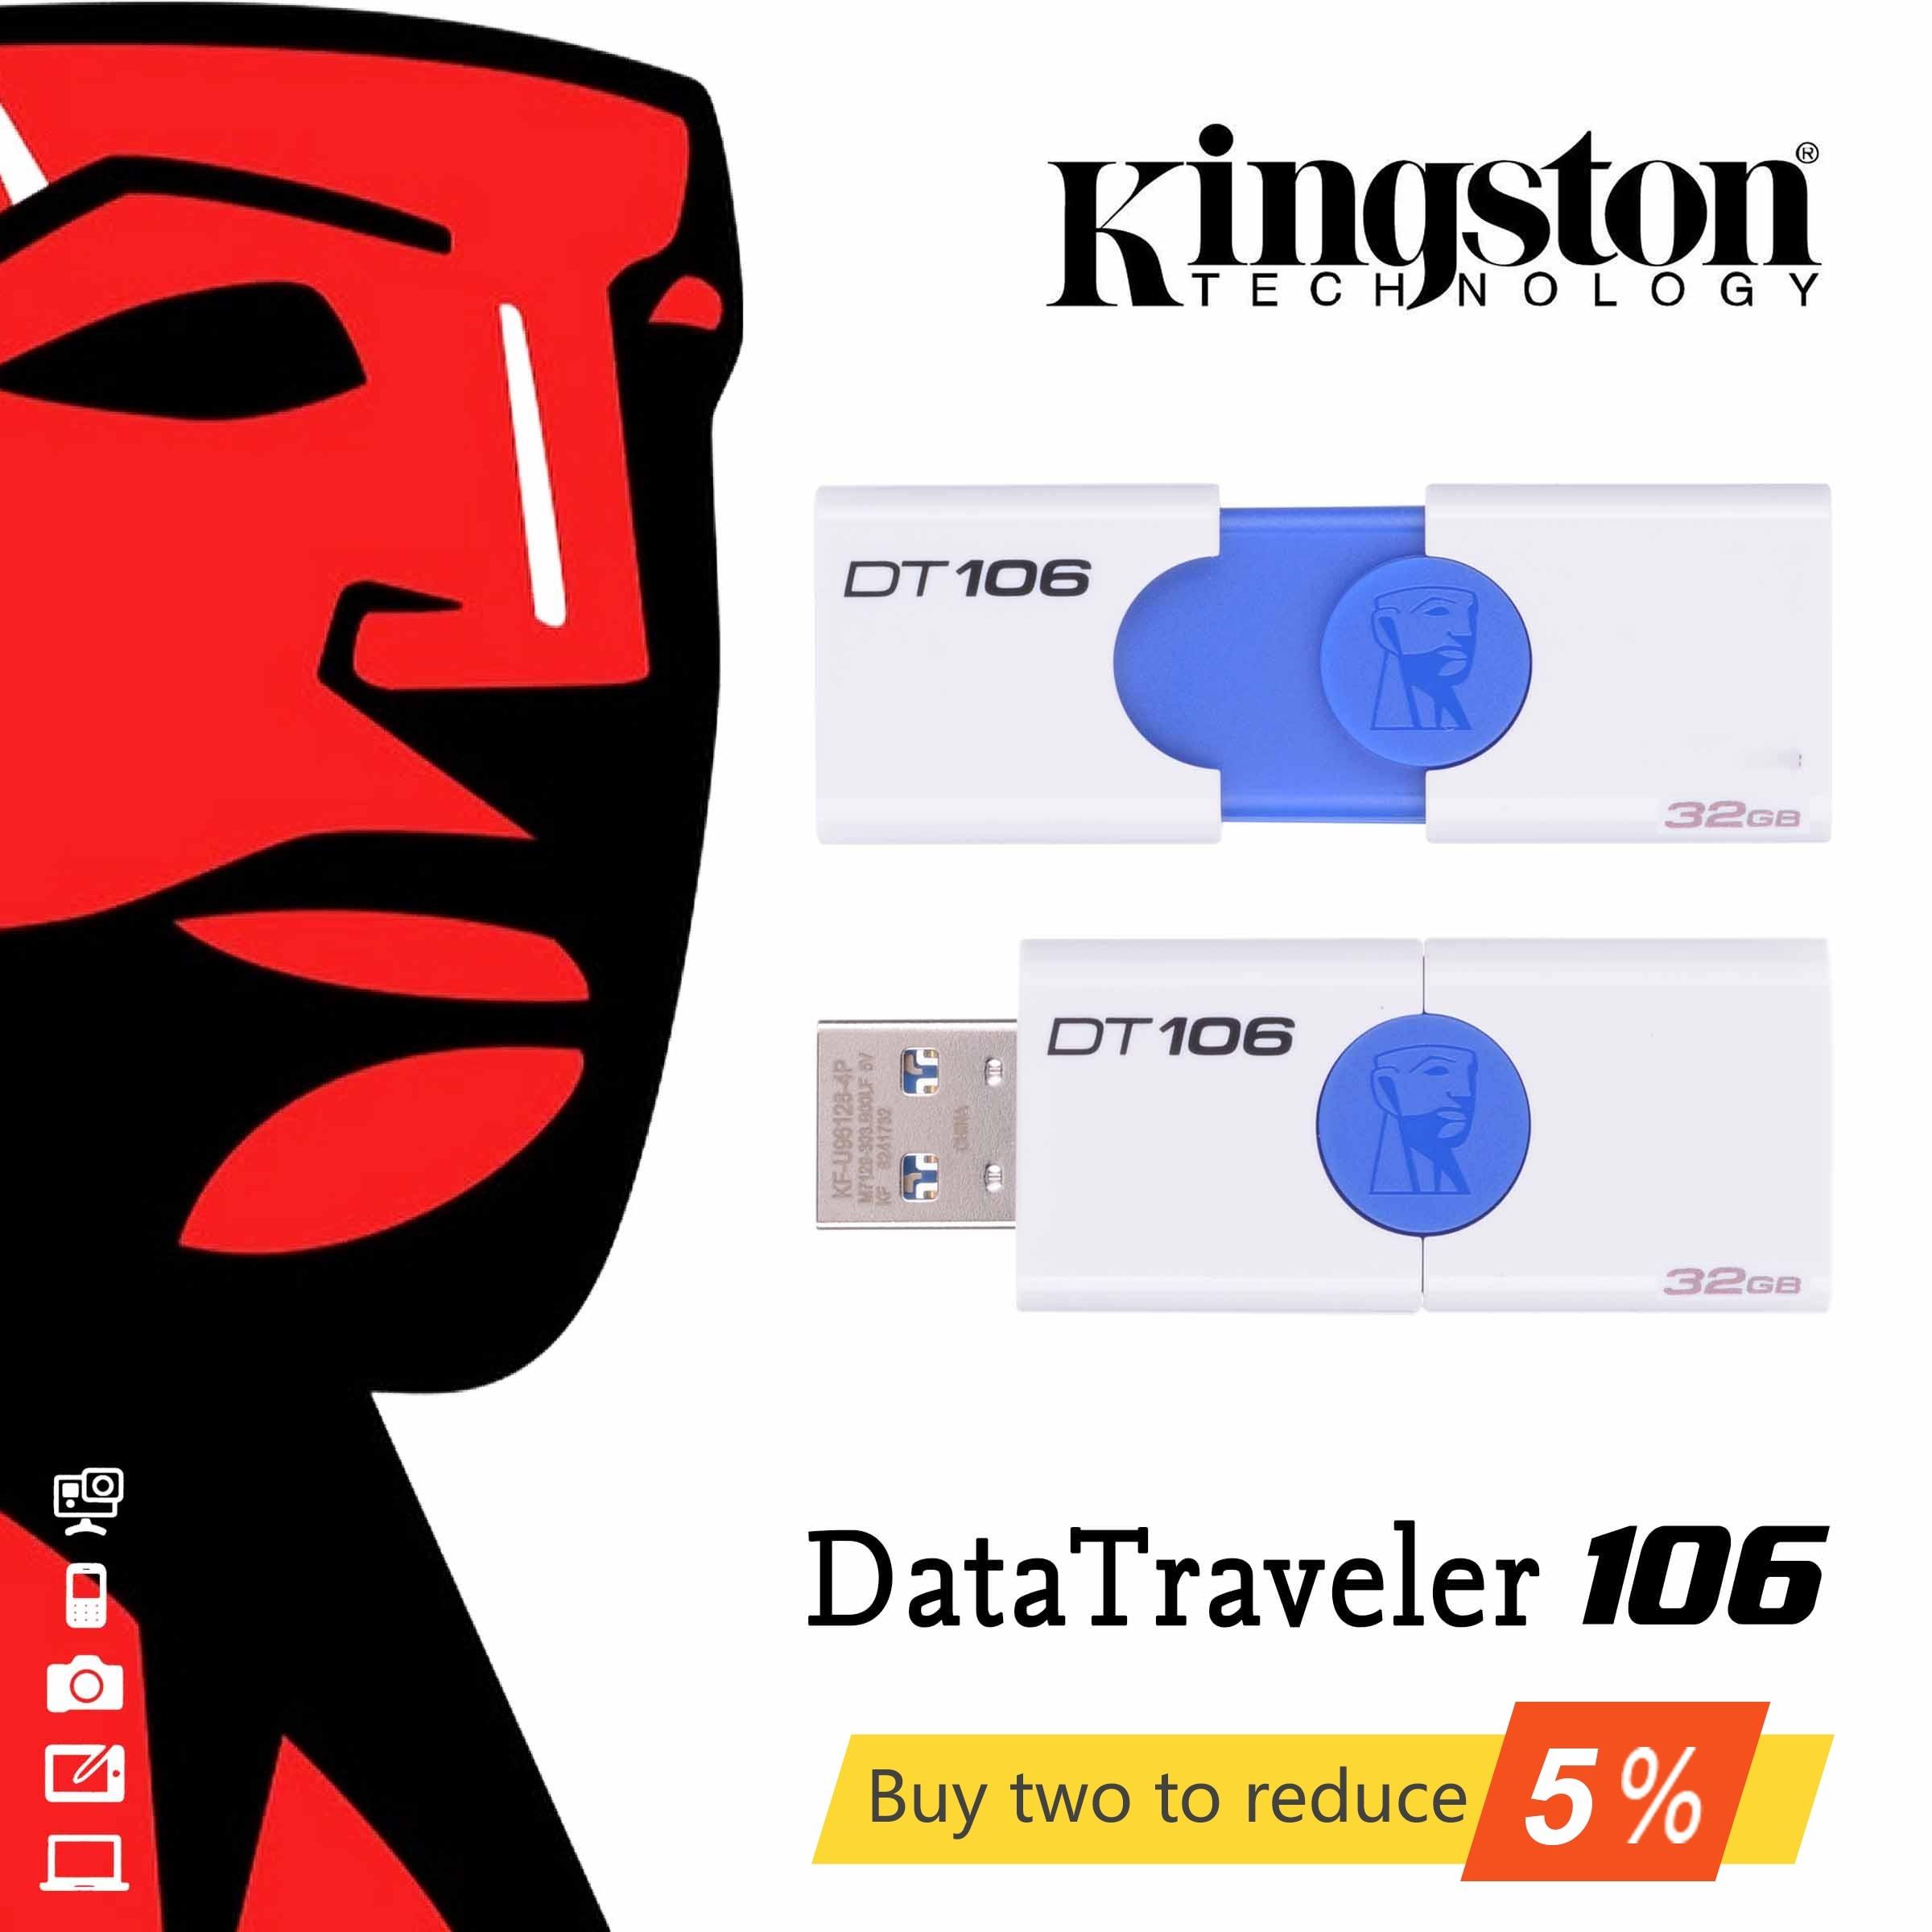 Datavoyageur 106 DT106 Original USB 3.0 Kingston clé USB 16GB 32GB 64GB 128 GB U disque stylo clé USB 16 32 64 128 GB